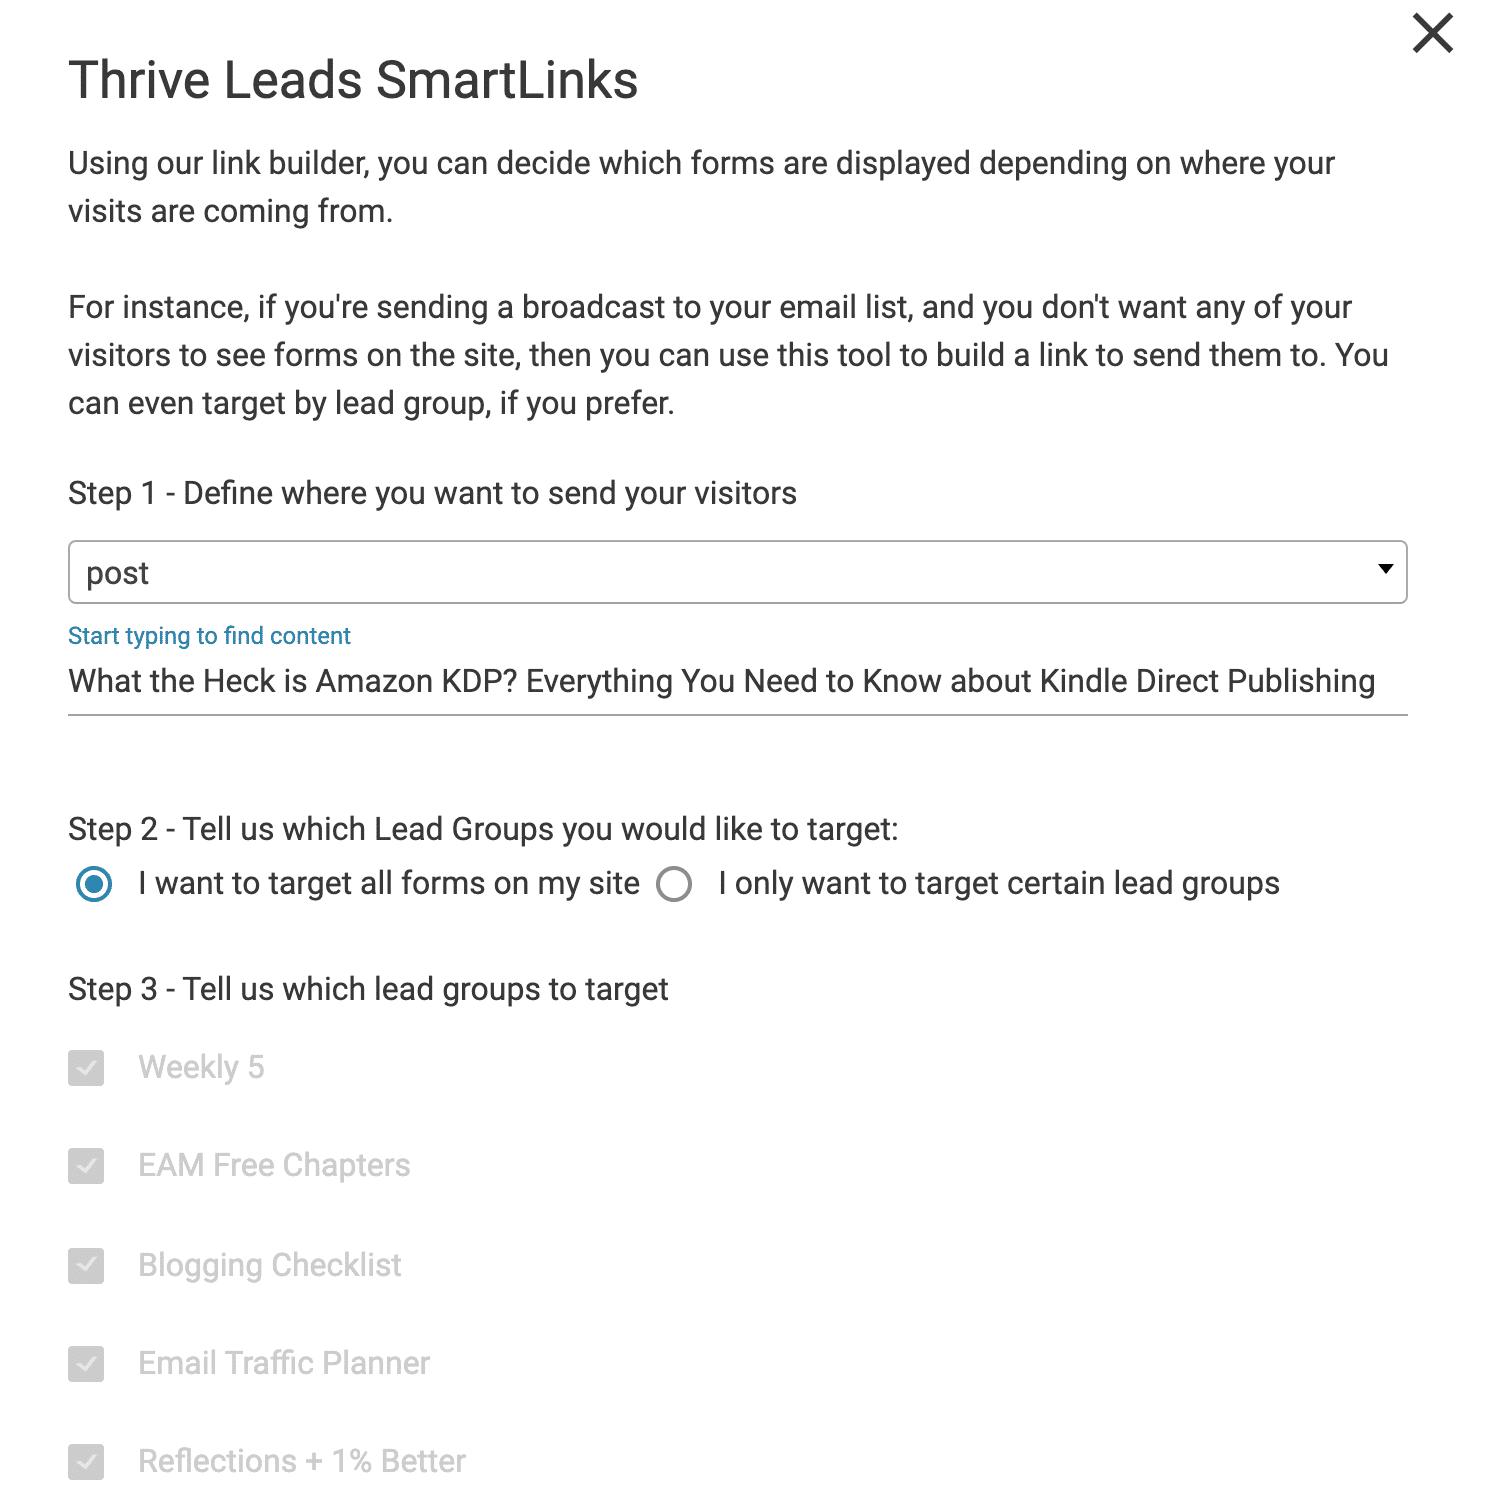 Thrive Smart Links